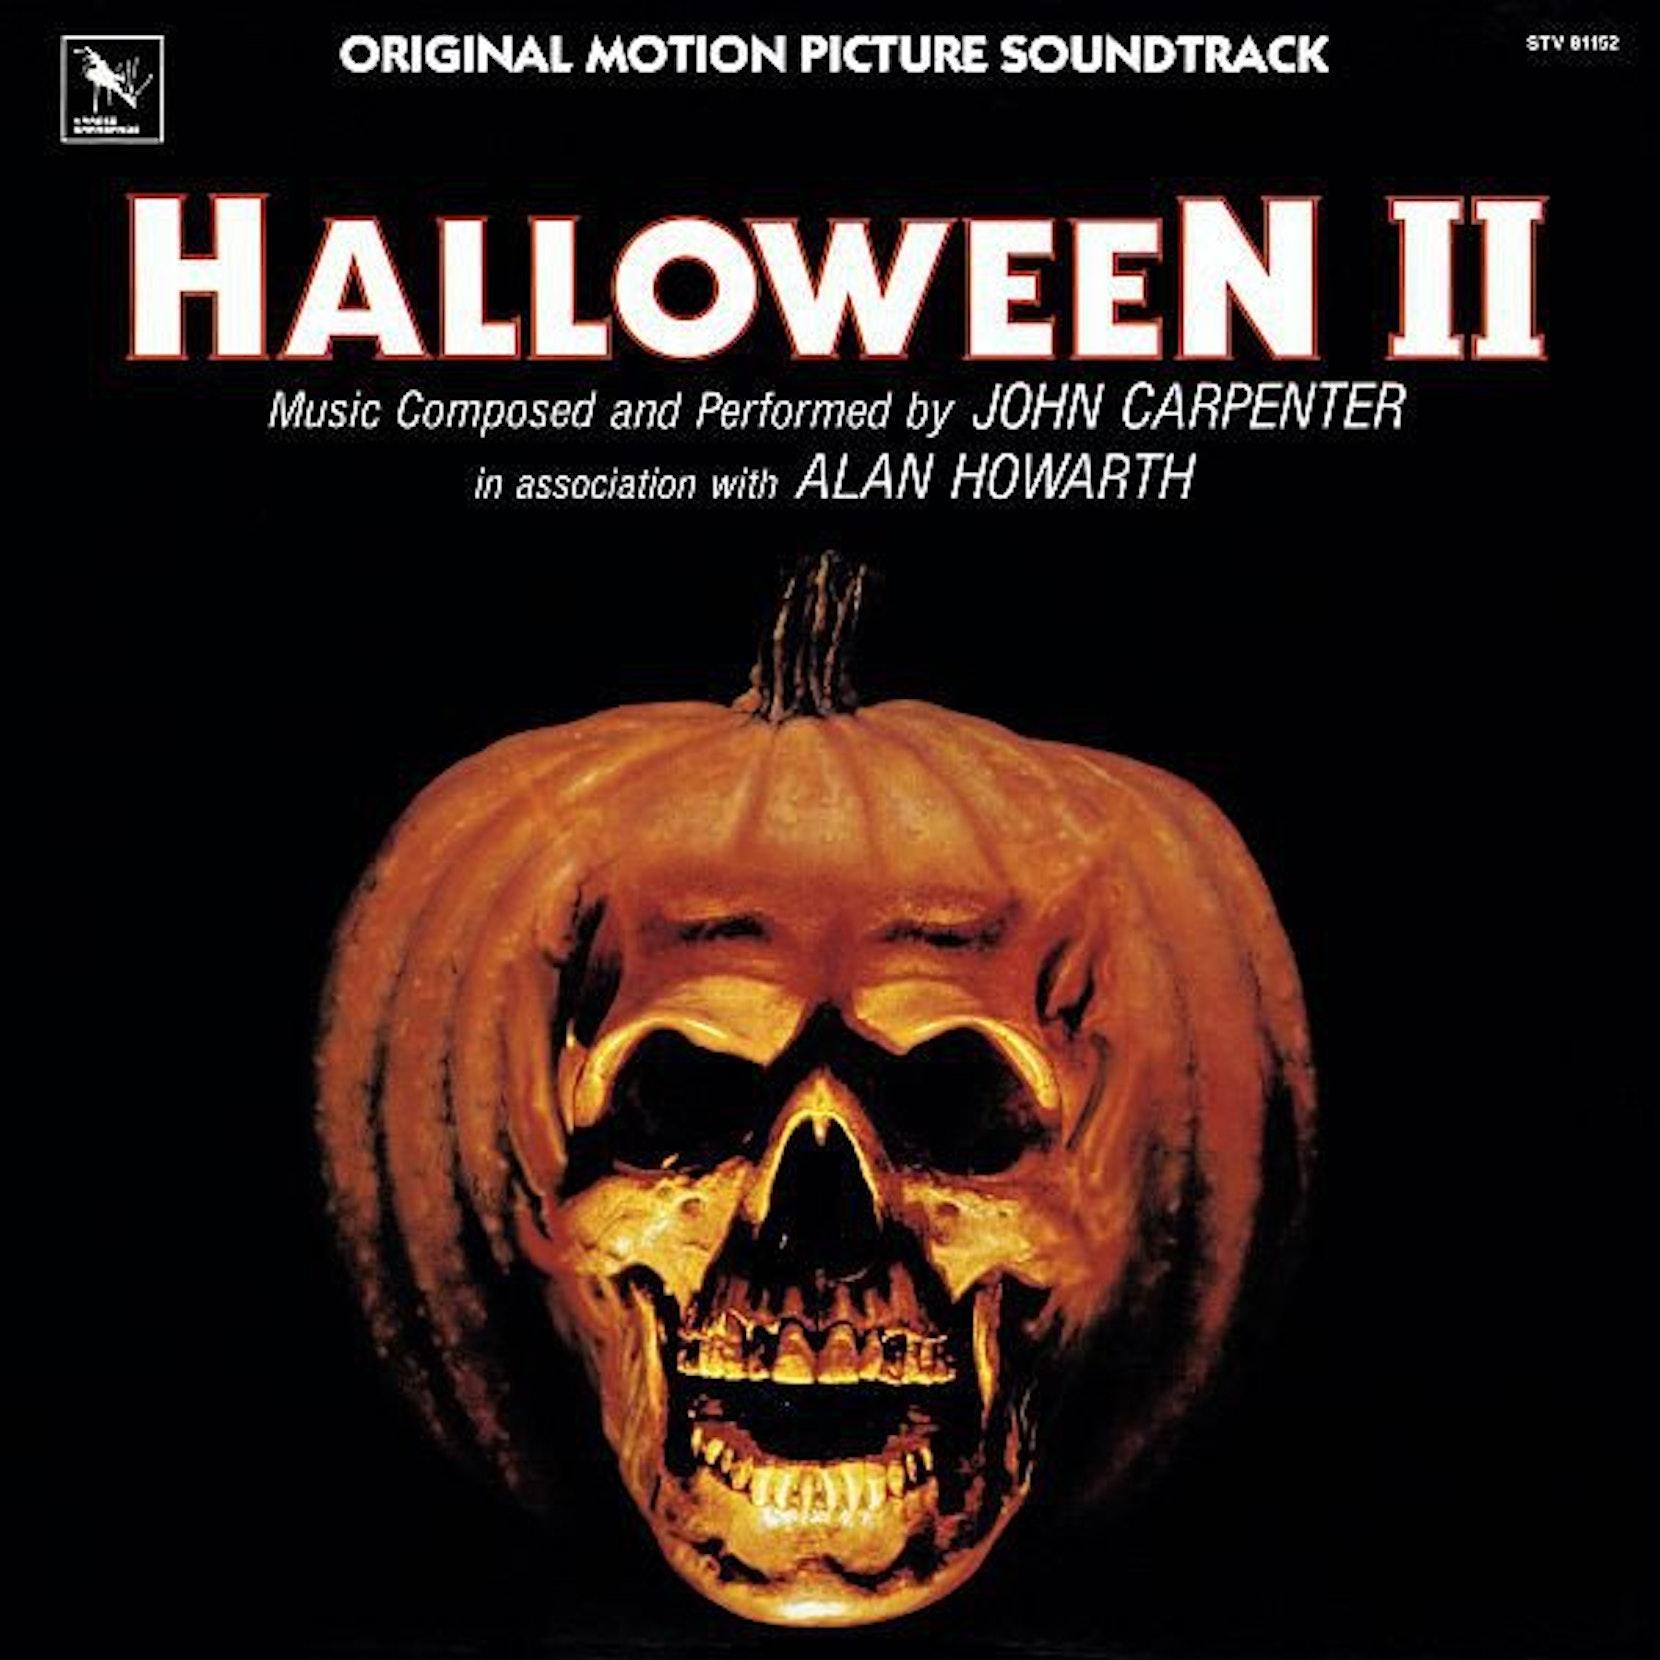 The 10 Best Horror Movie Scores To Own On Vinyl — Vinyl Me